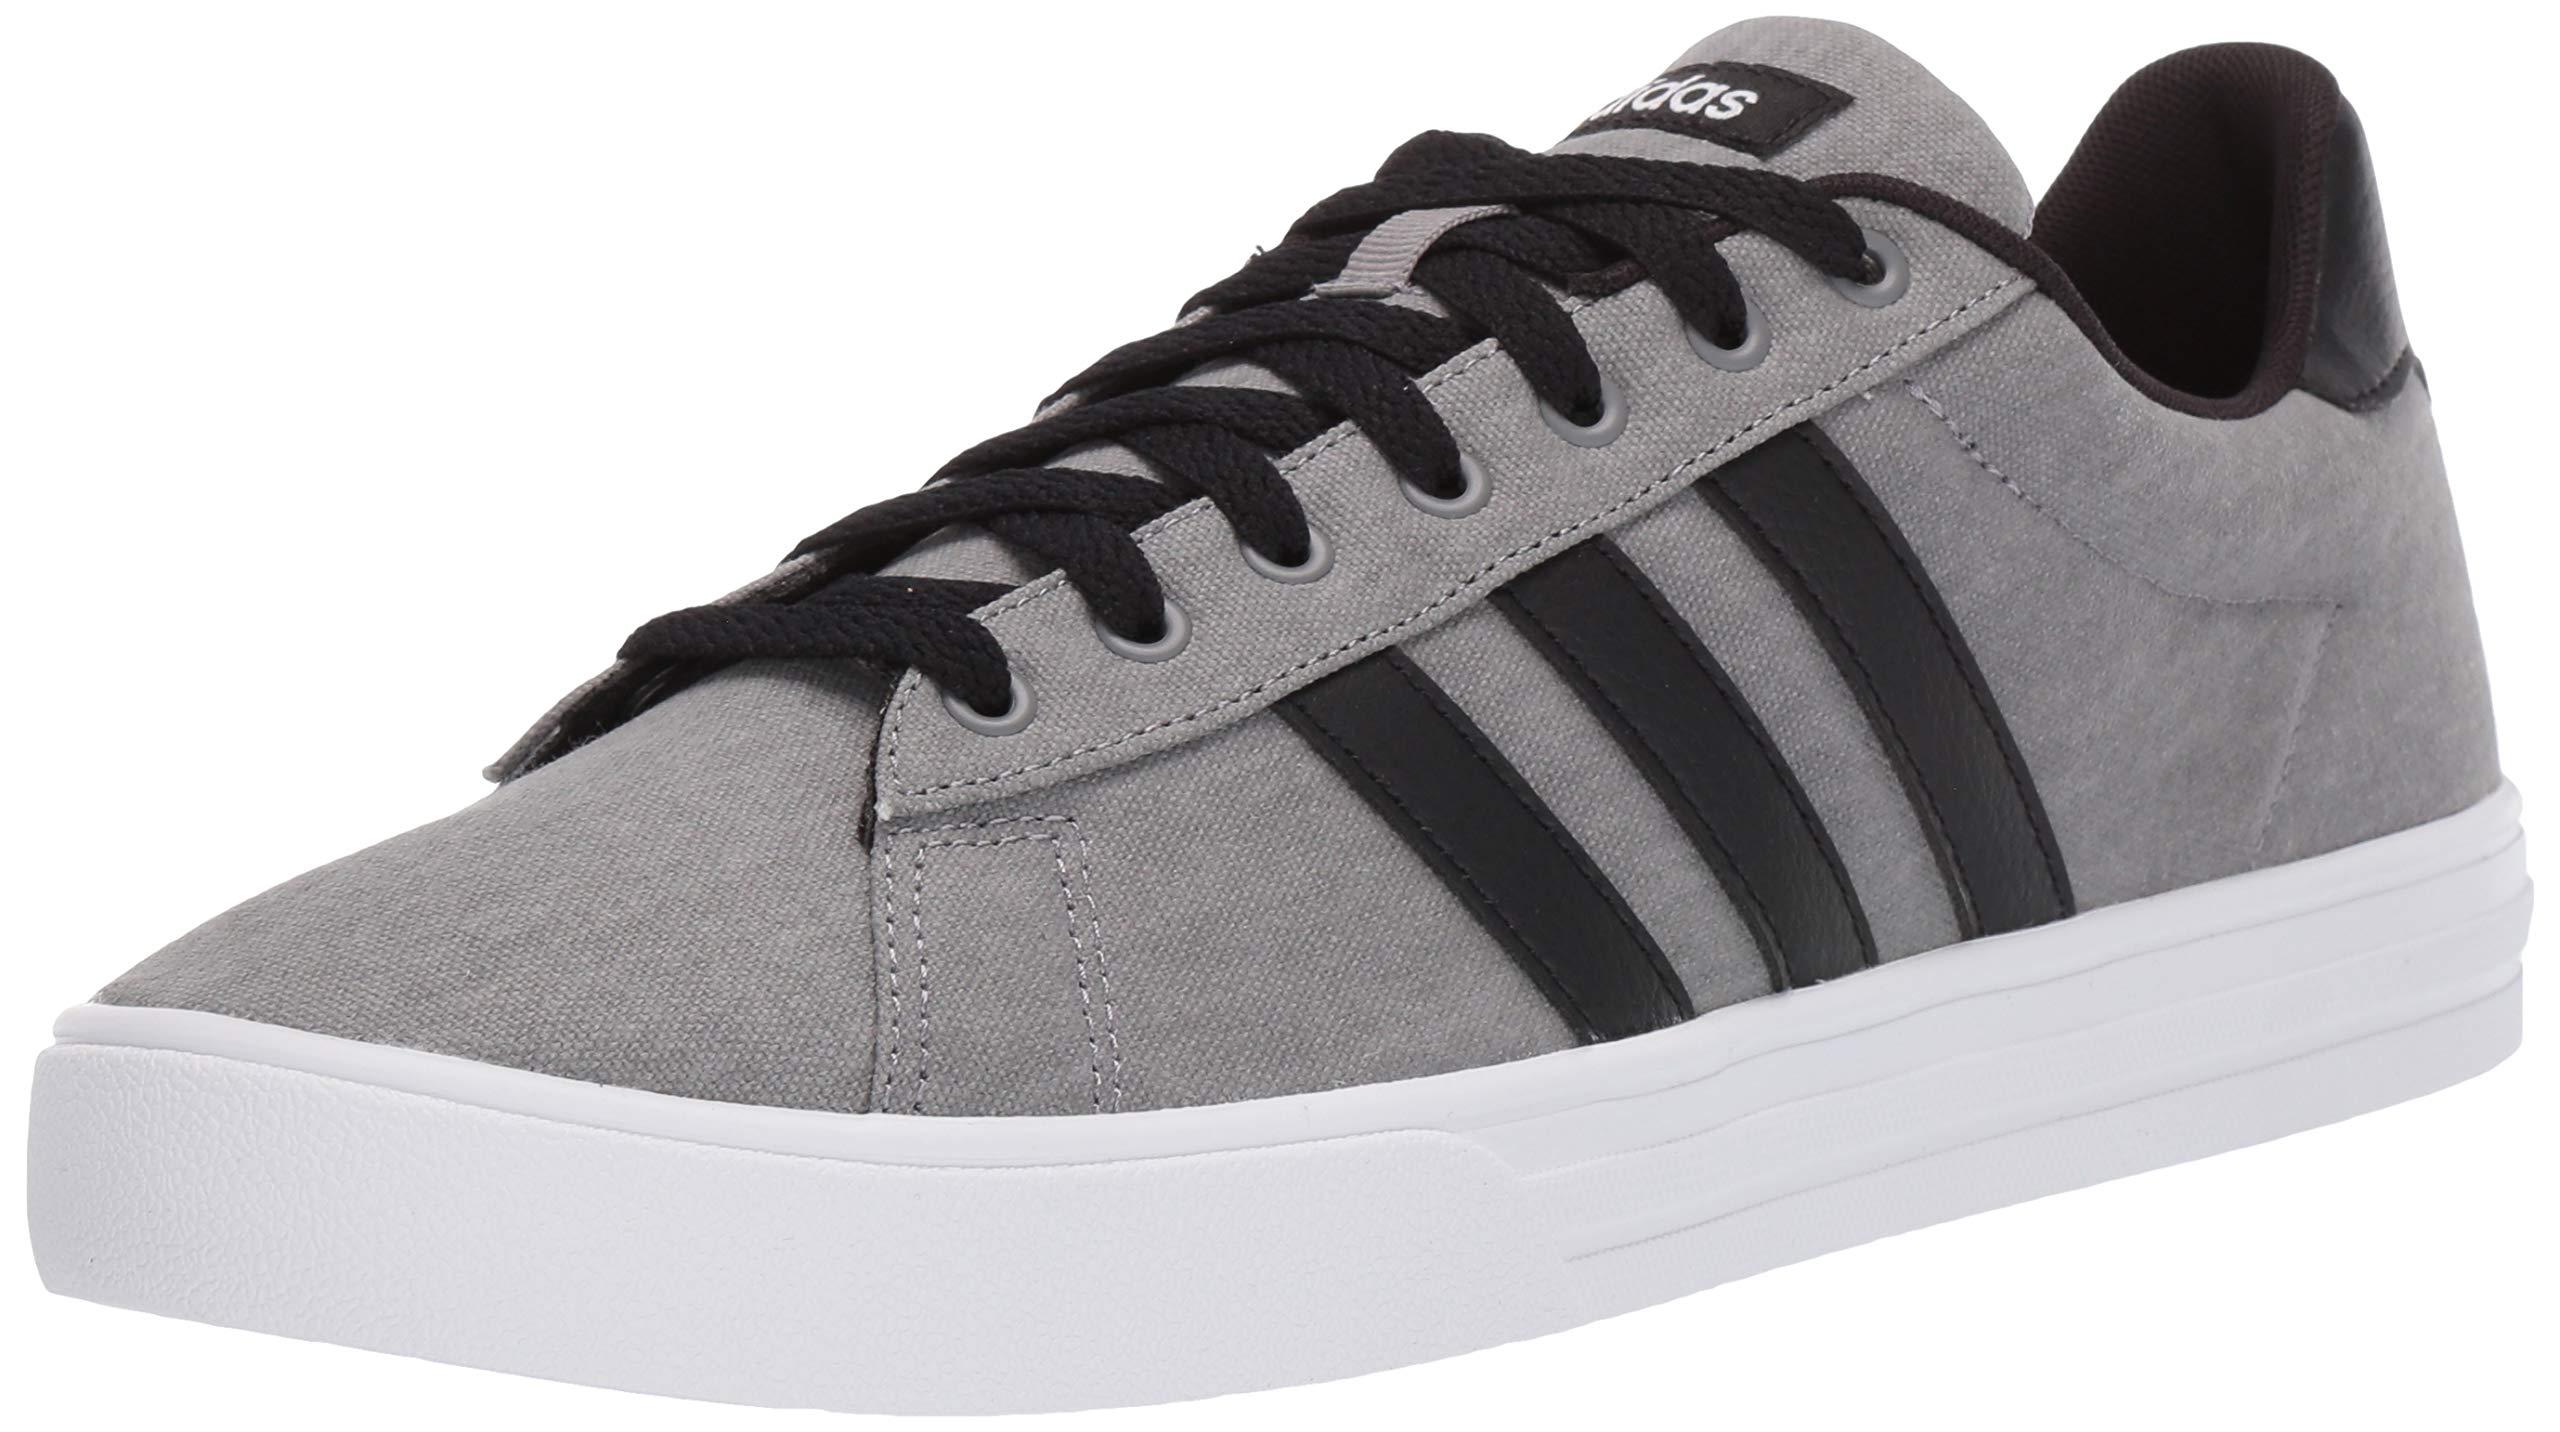 adidas Men's Daily 2.0 Sneaker, Grey/Black/White, 10 M US